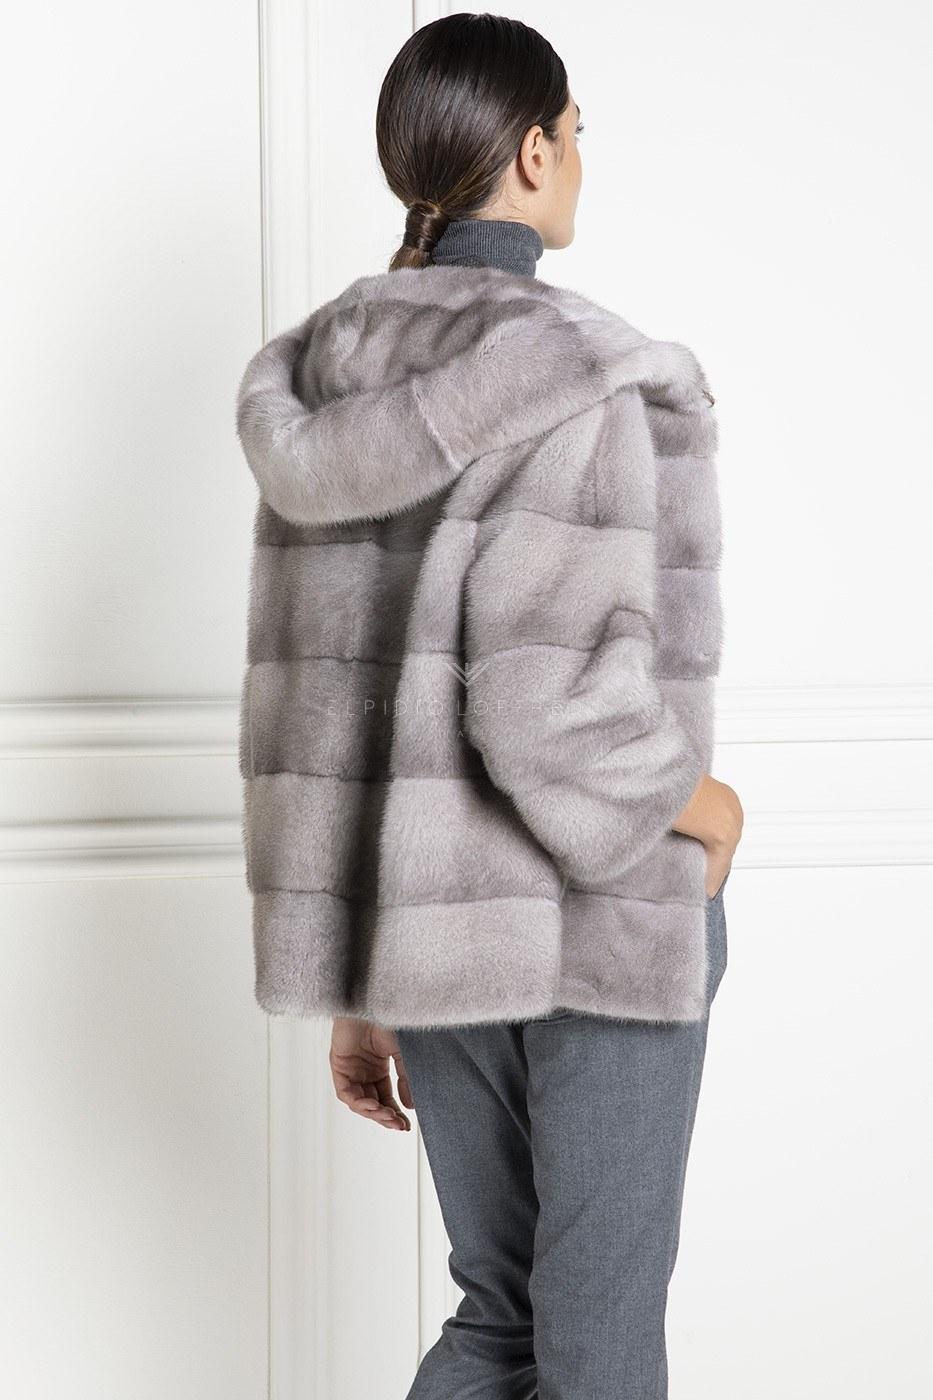 Silverblue Mink Jacket with Hoodie - Length 65 cm